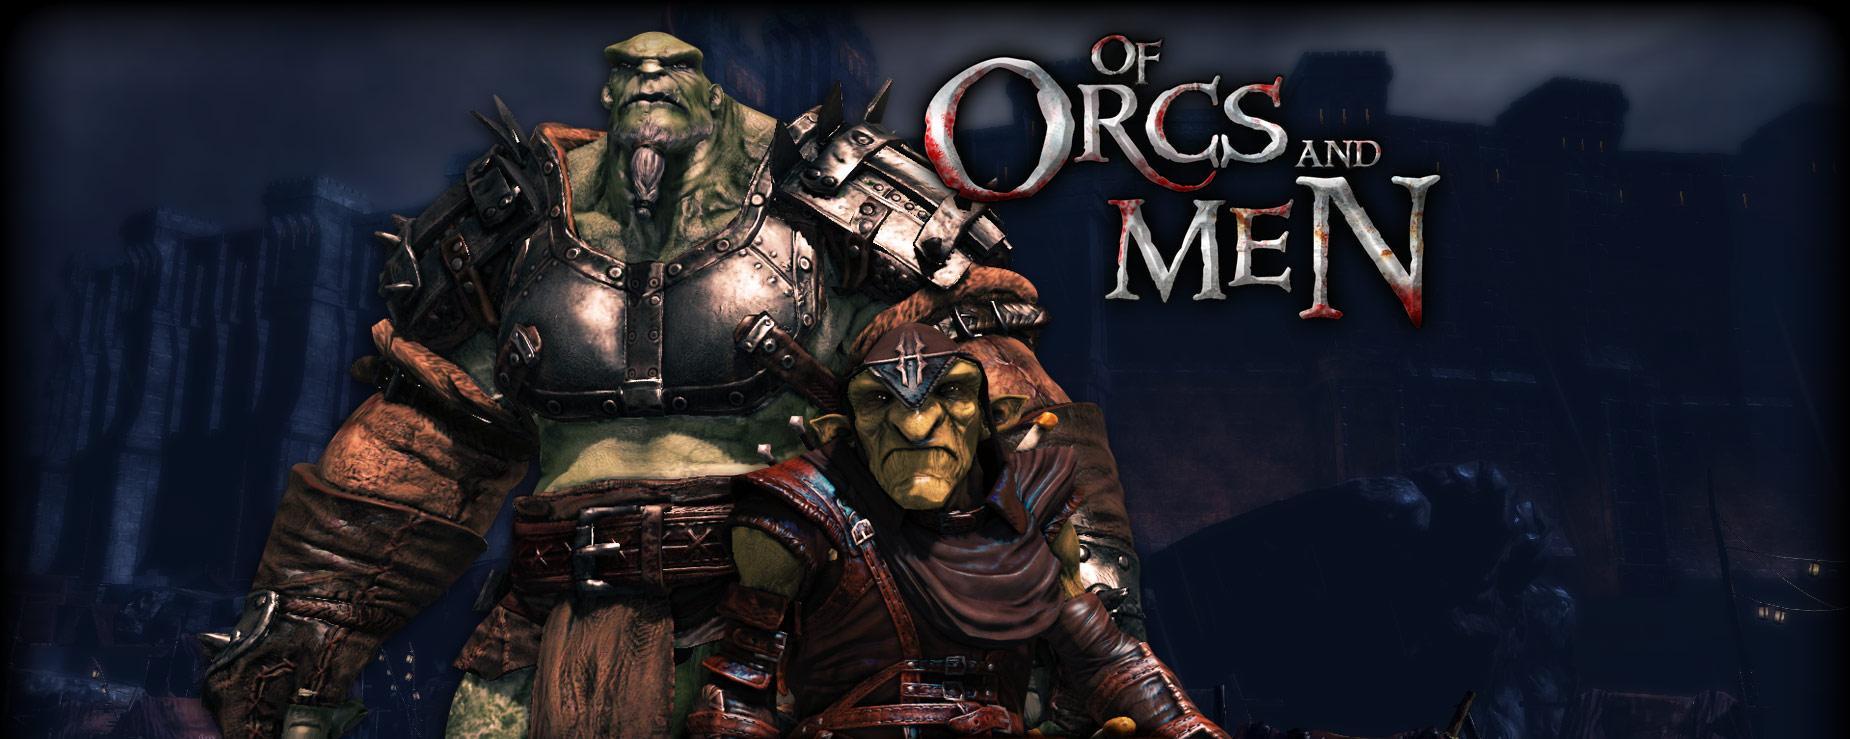 orc_goblin